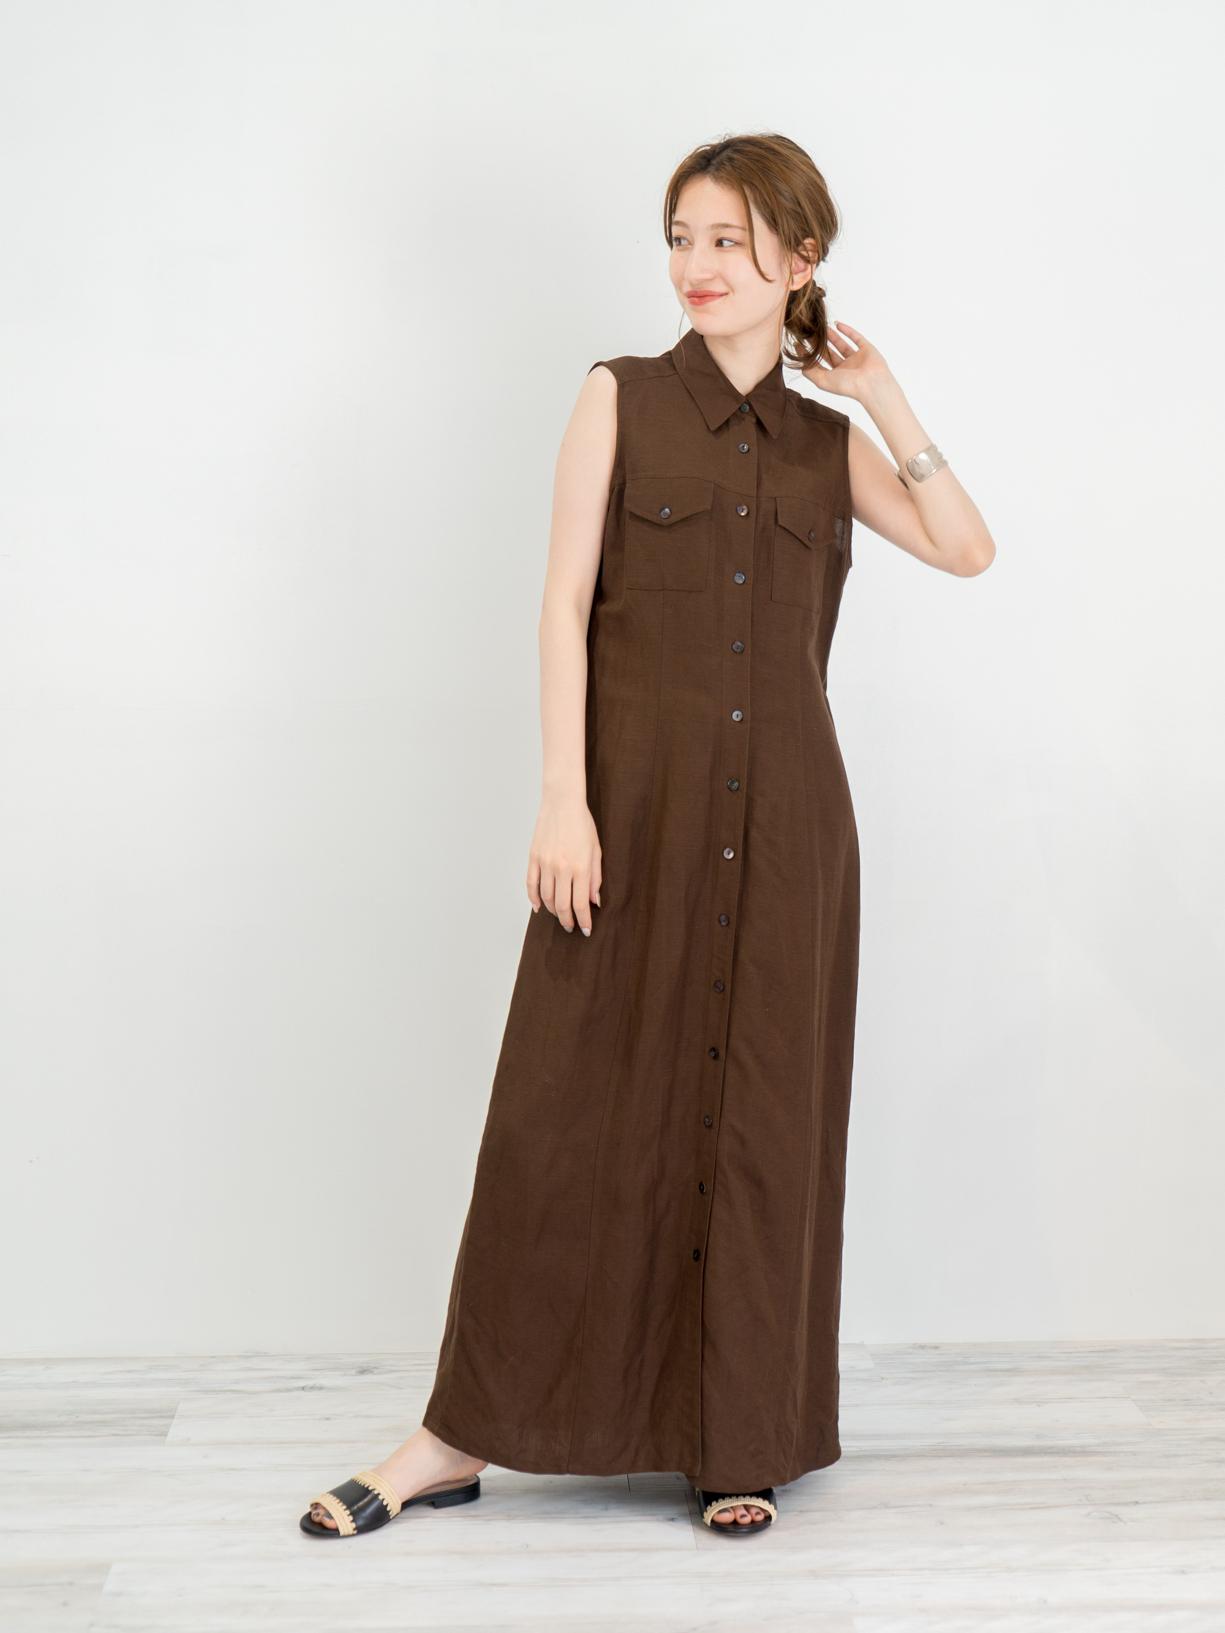 ◼︎90s shirts style linen maxi dress from U.S.A◼︎